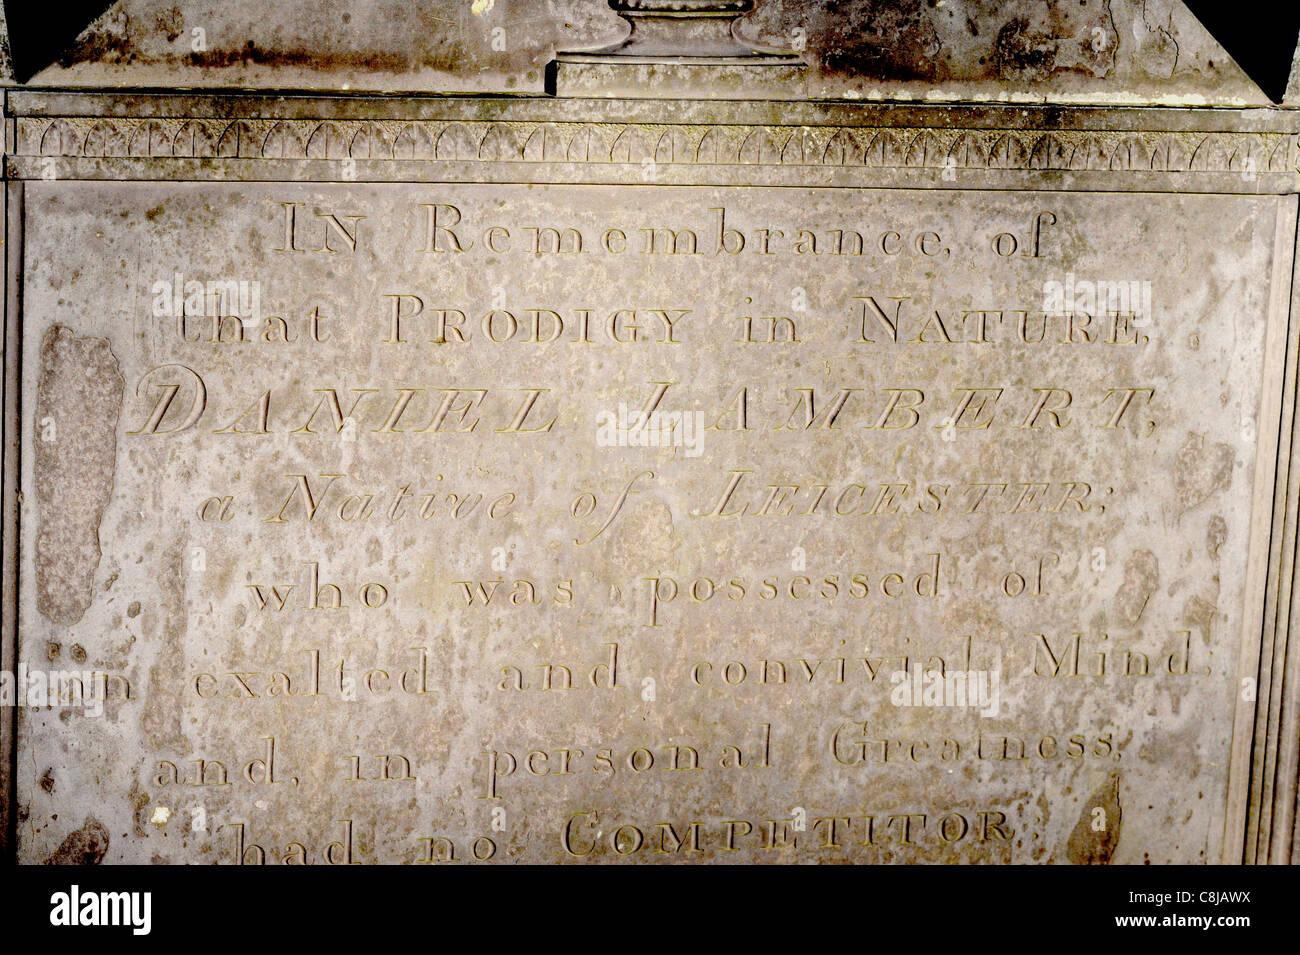 Daniel Lambert's gravestone at Stamford. - Stock Image